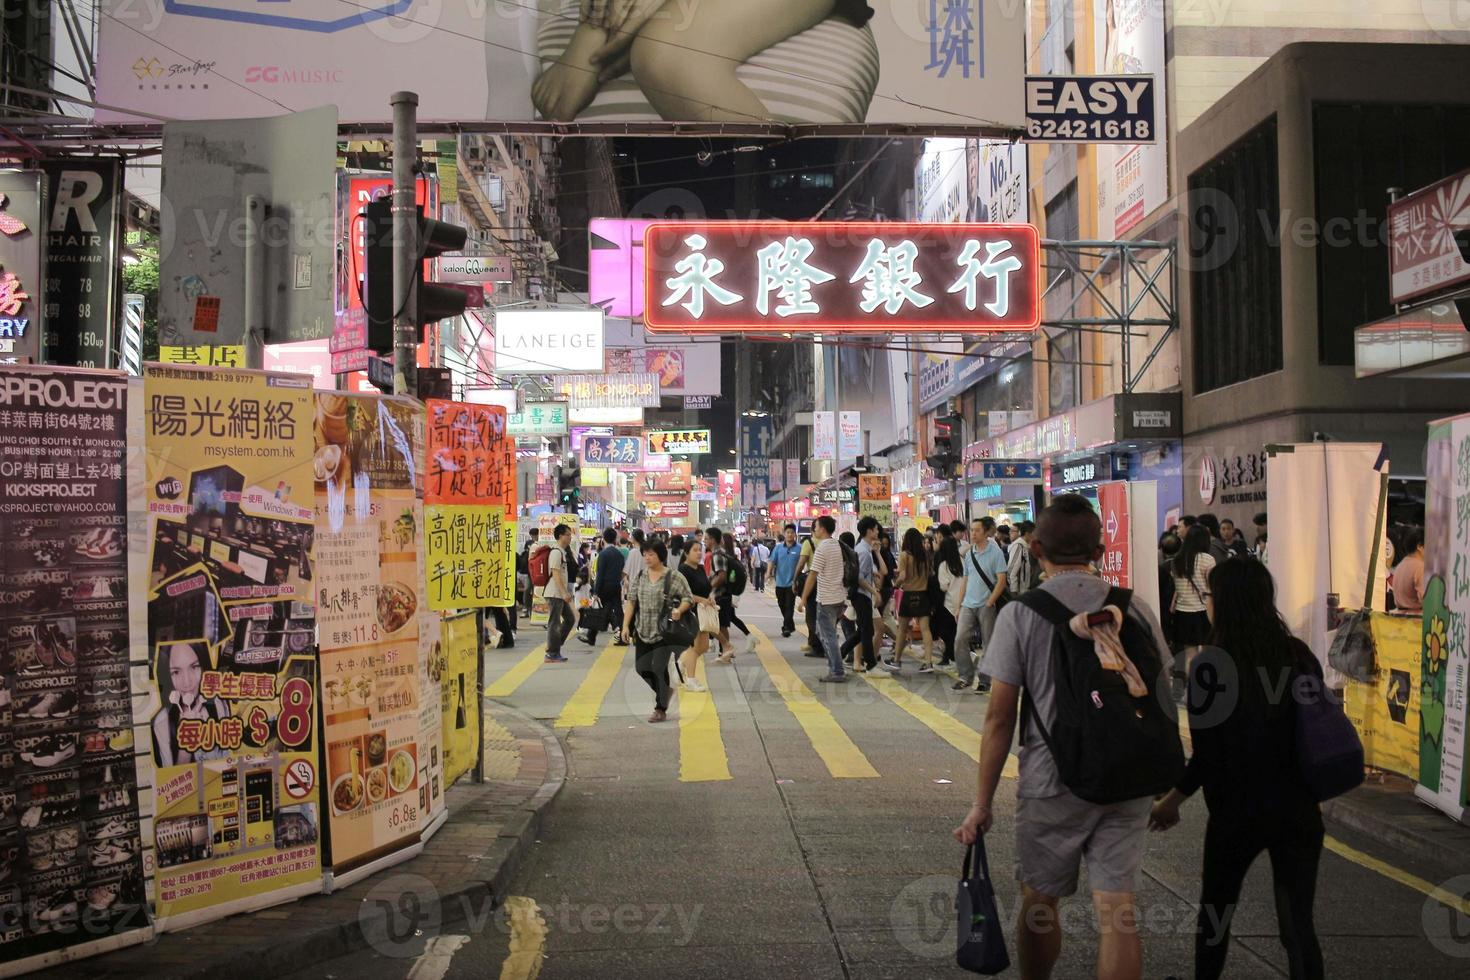 région de mongkok la nuit photo